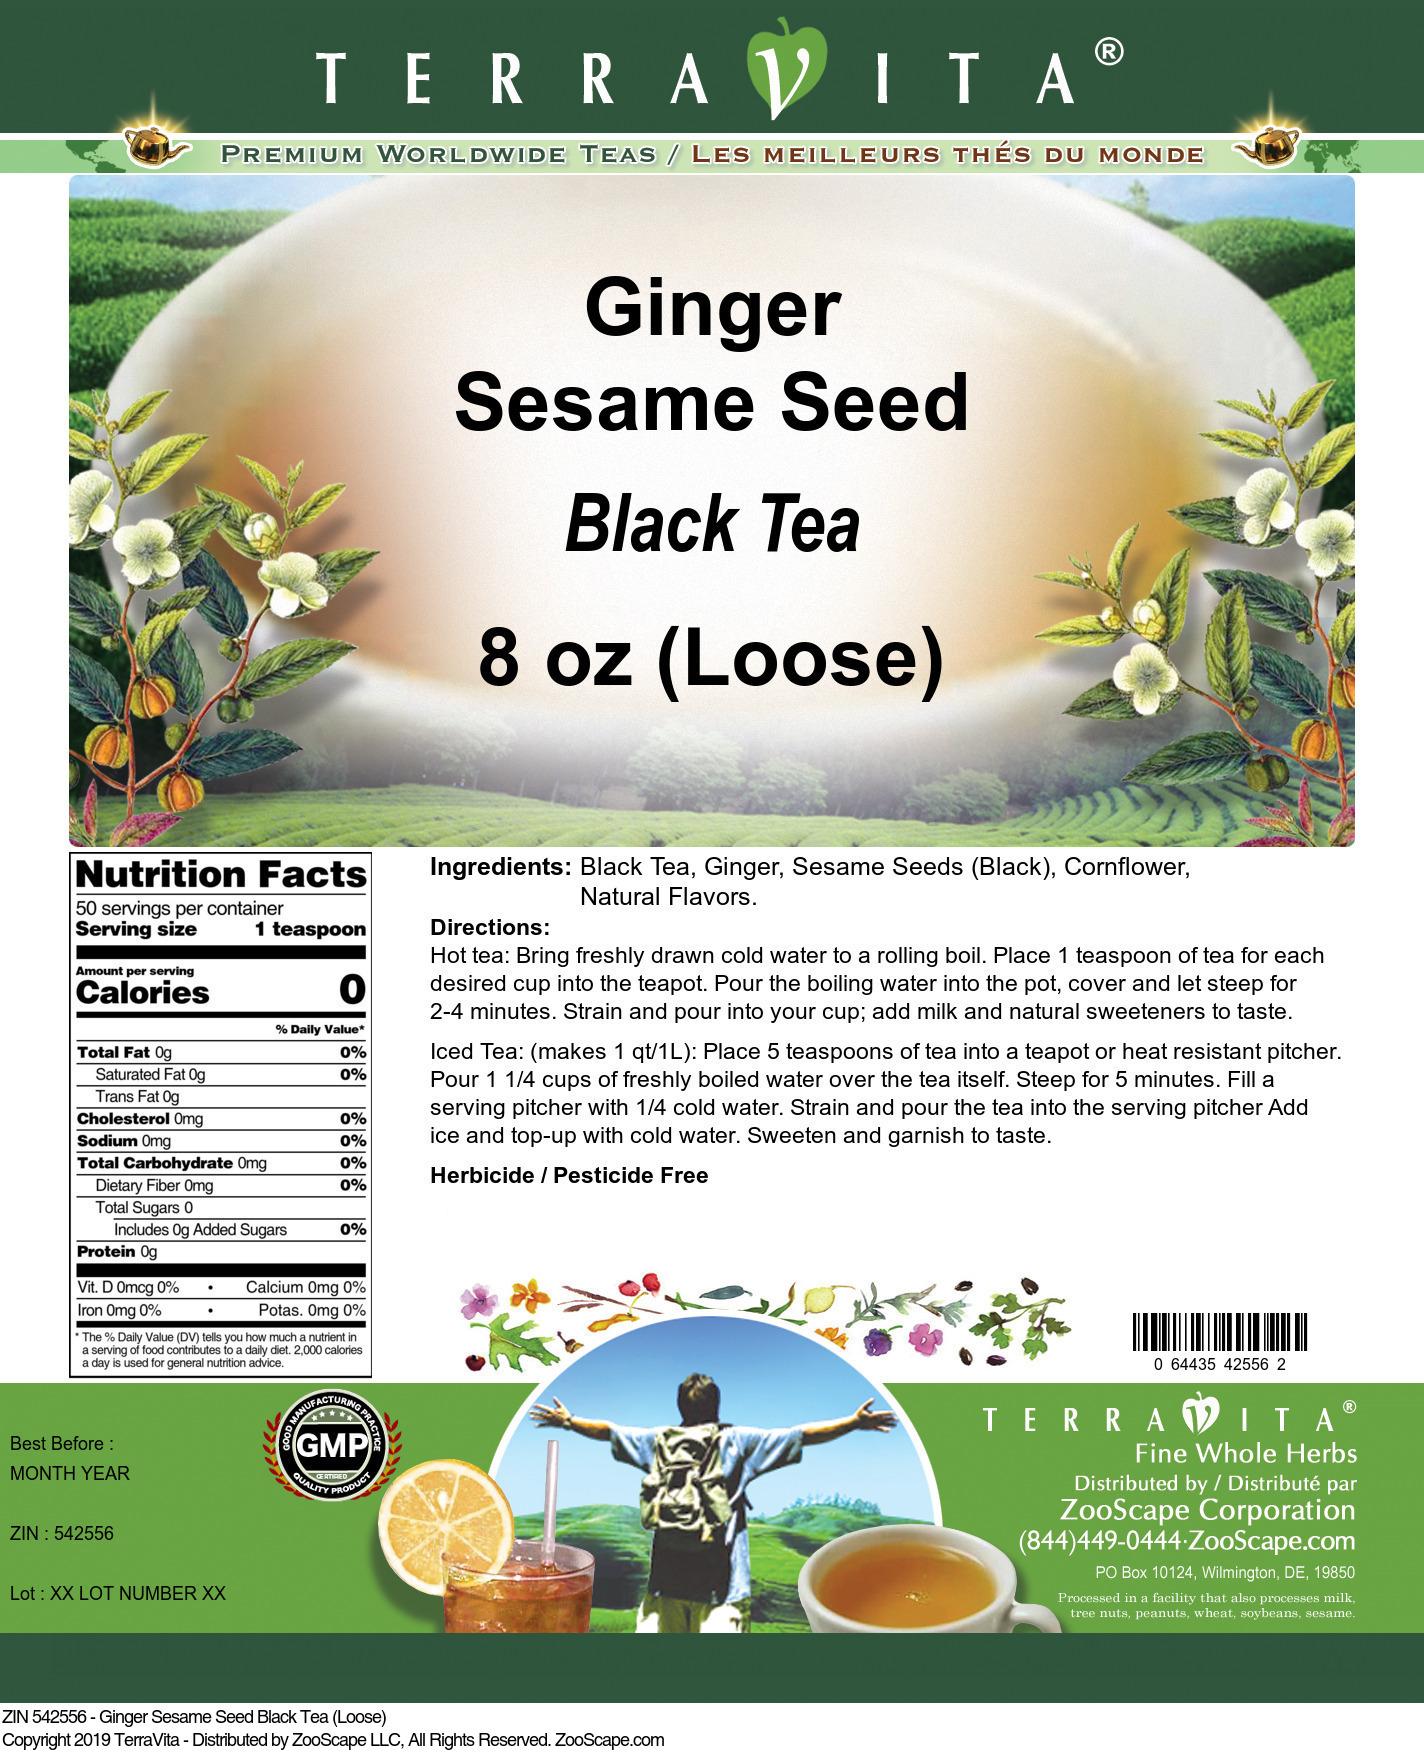 Ginger Sesame Seed Black Tea